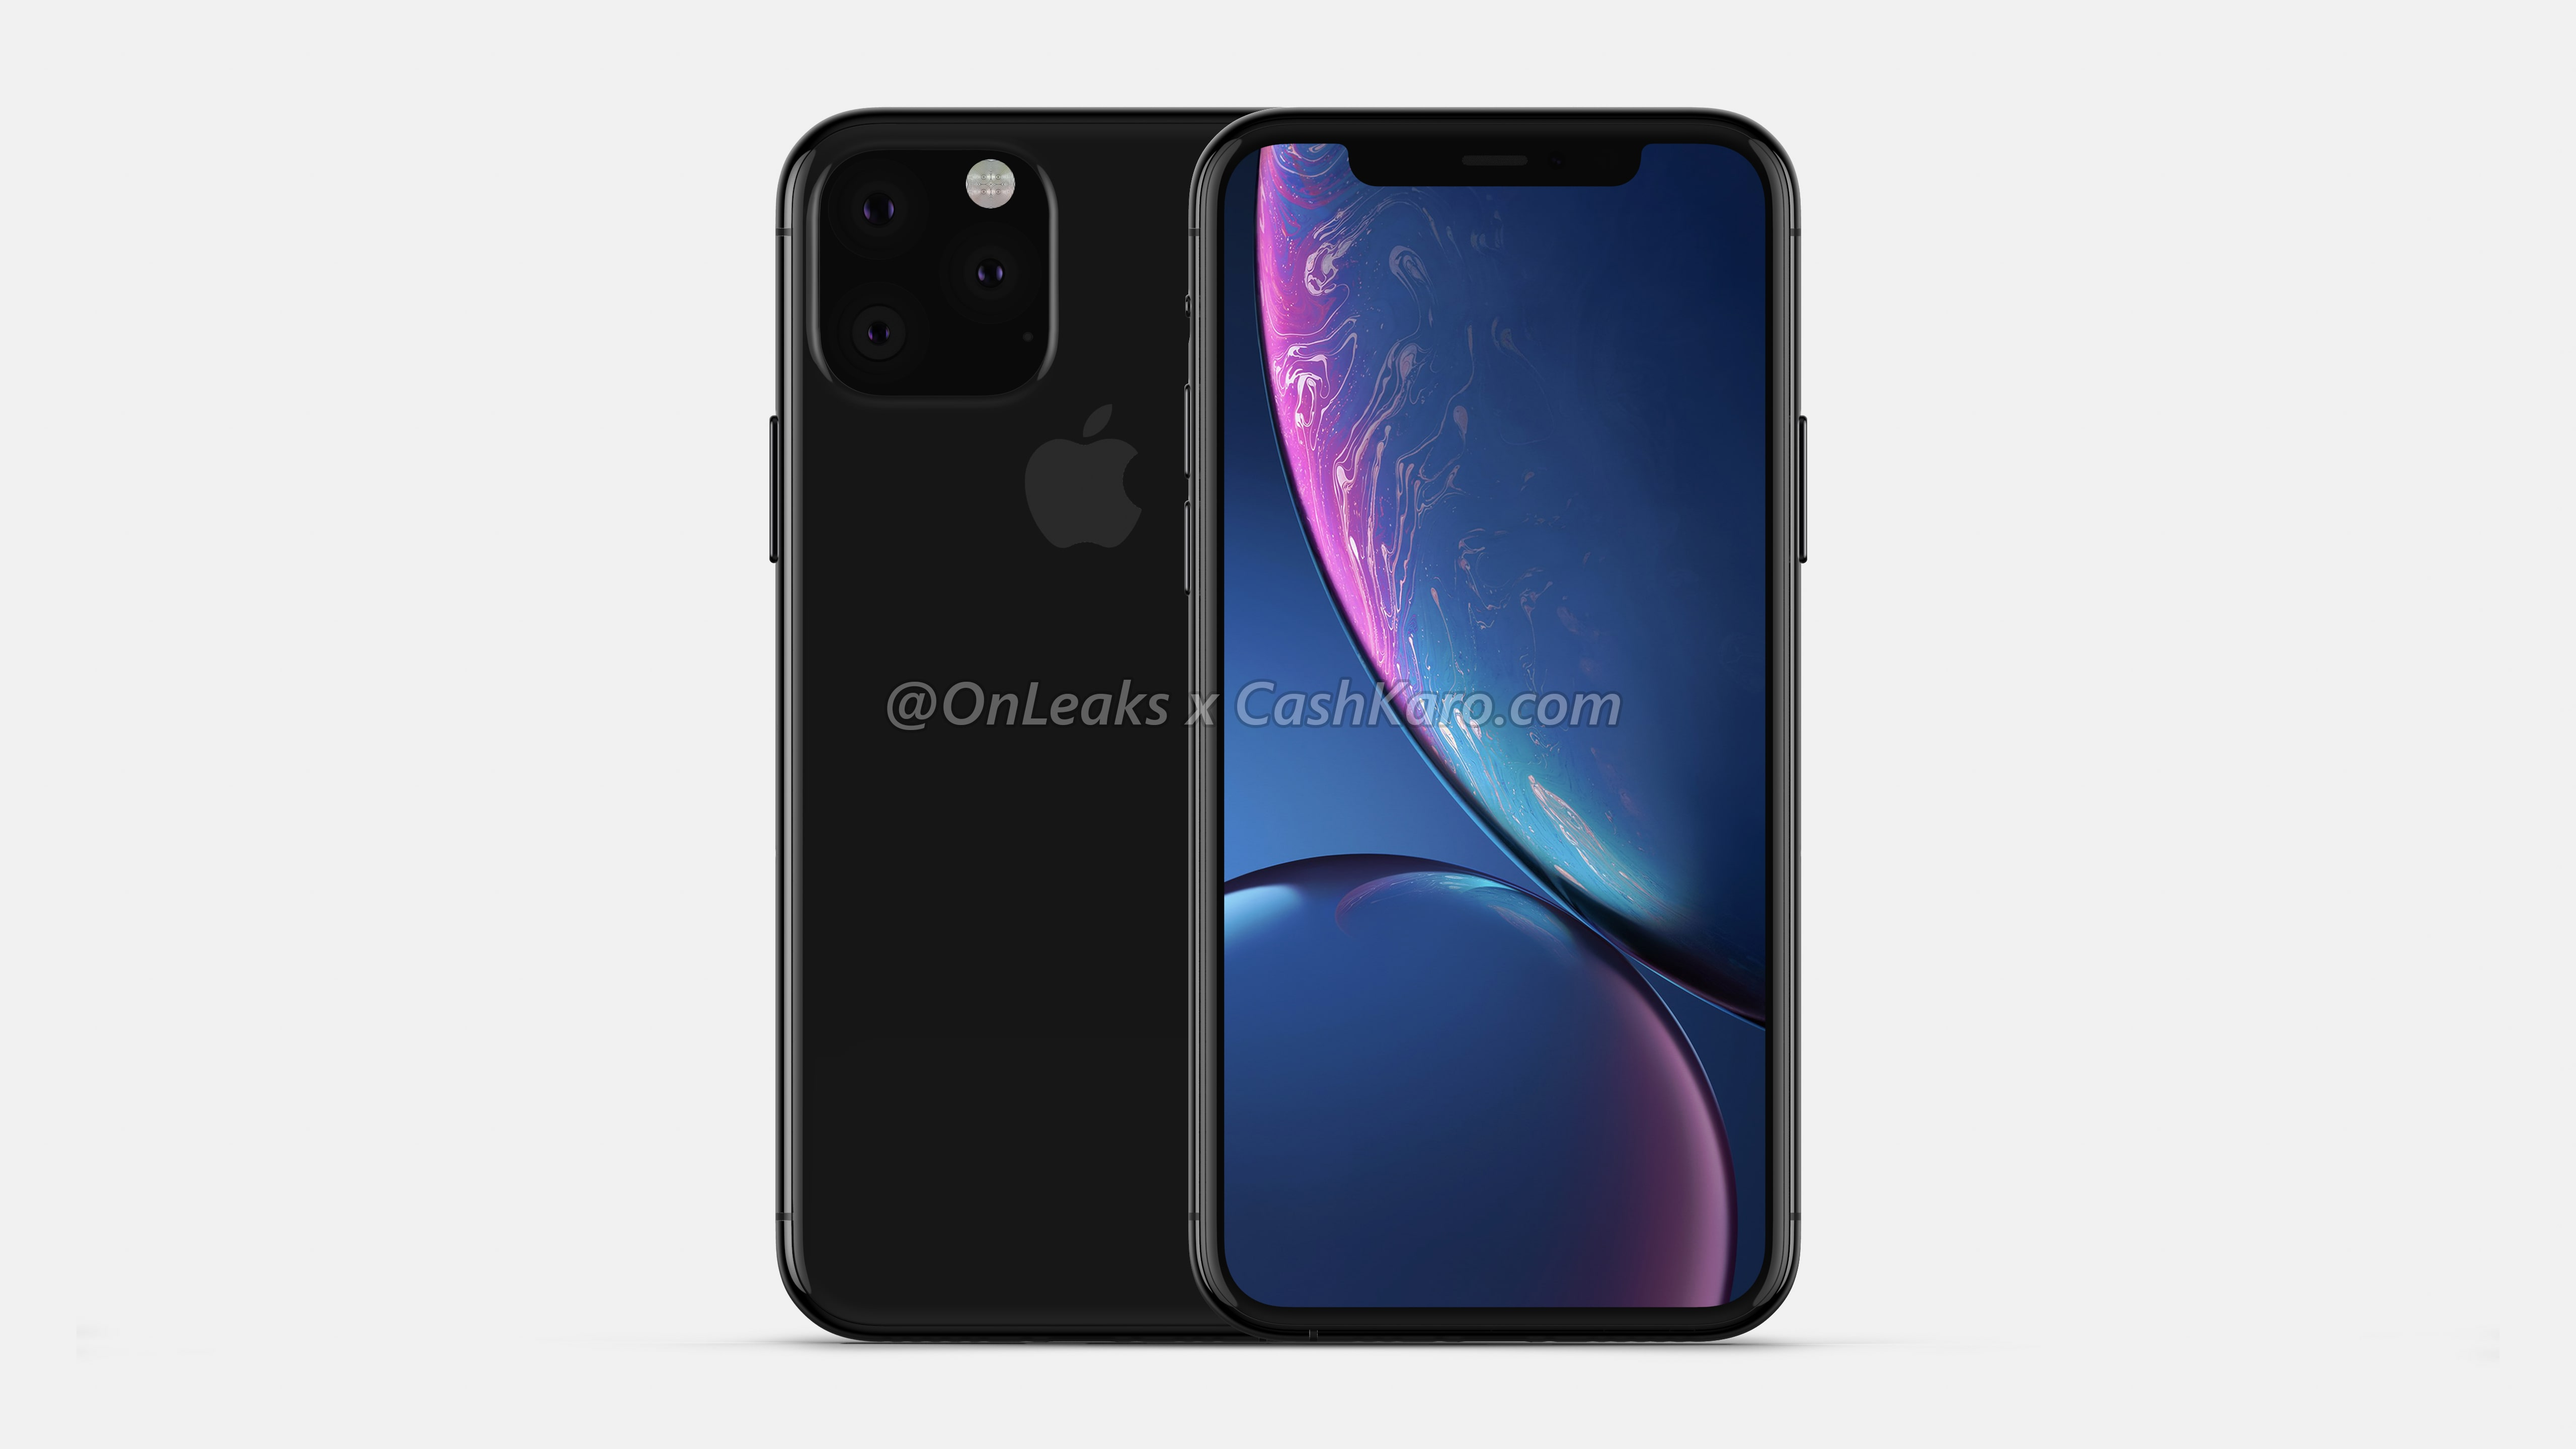 Apple iPhone XI : design, grosse encoche et appareil photo triangulaire